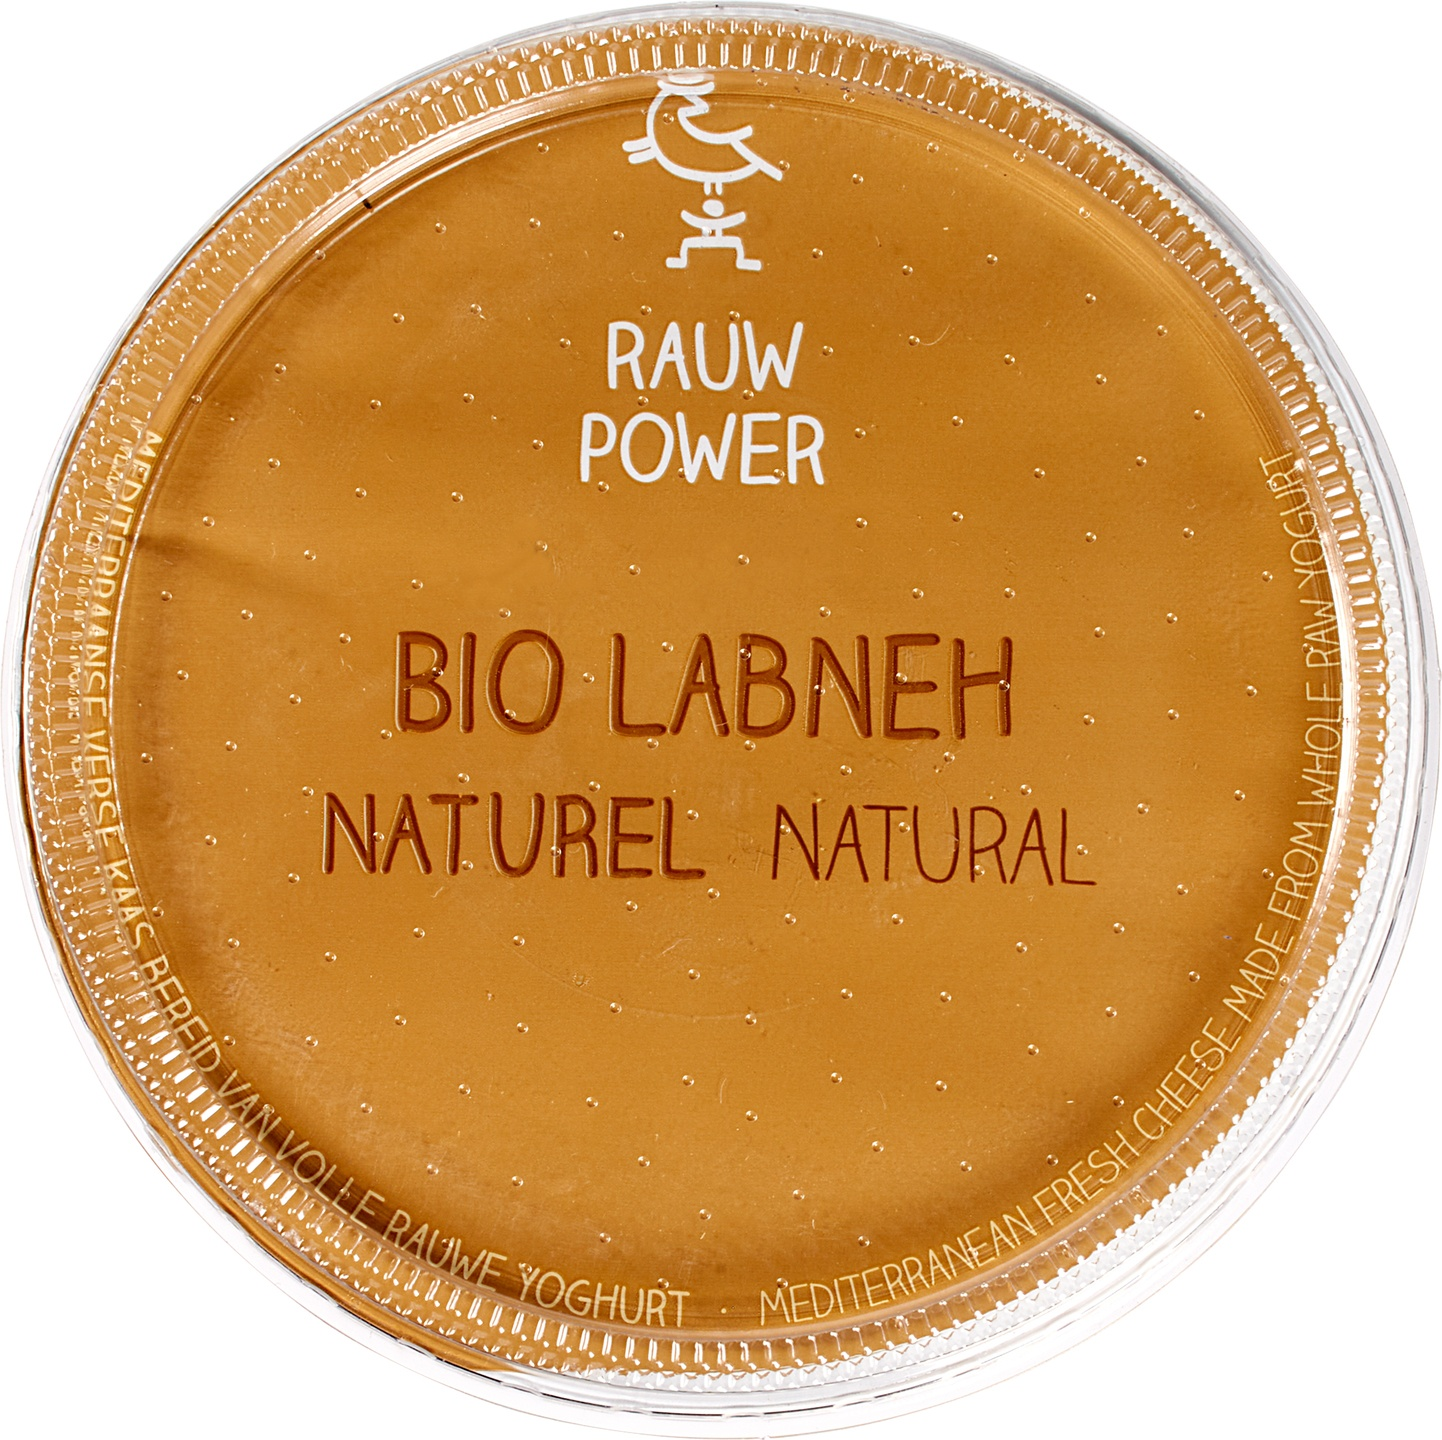 Biologische Rauw Power Labneh naturel 180 ml